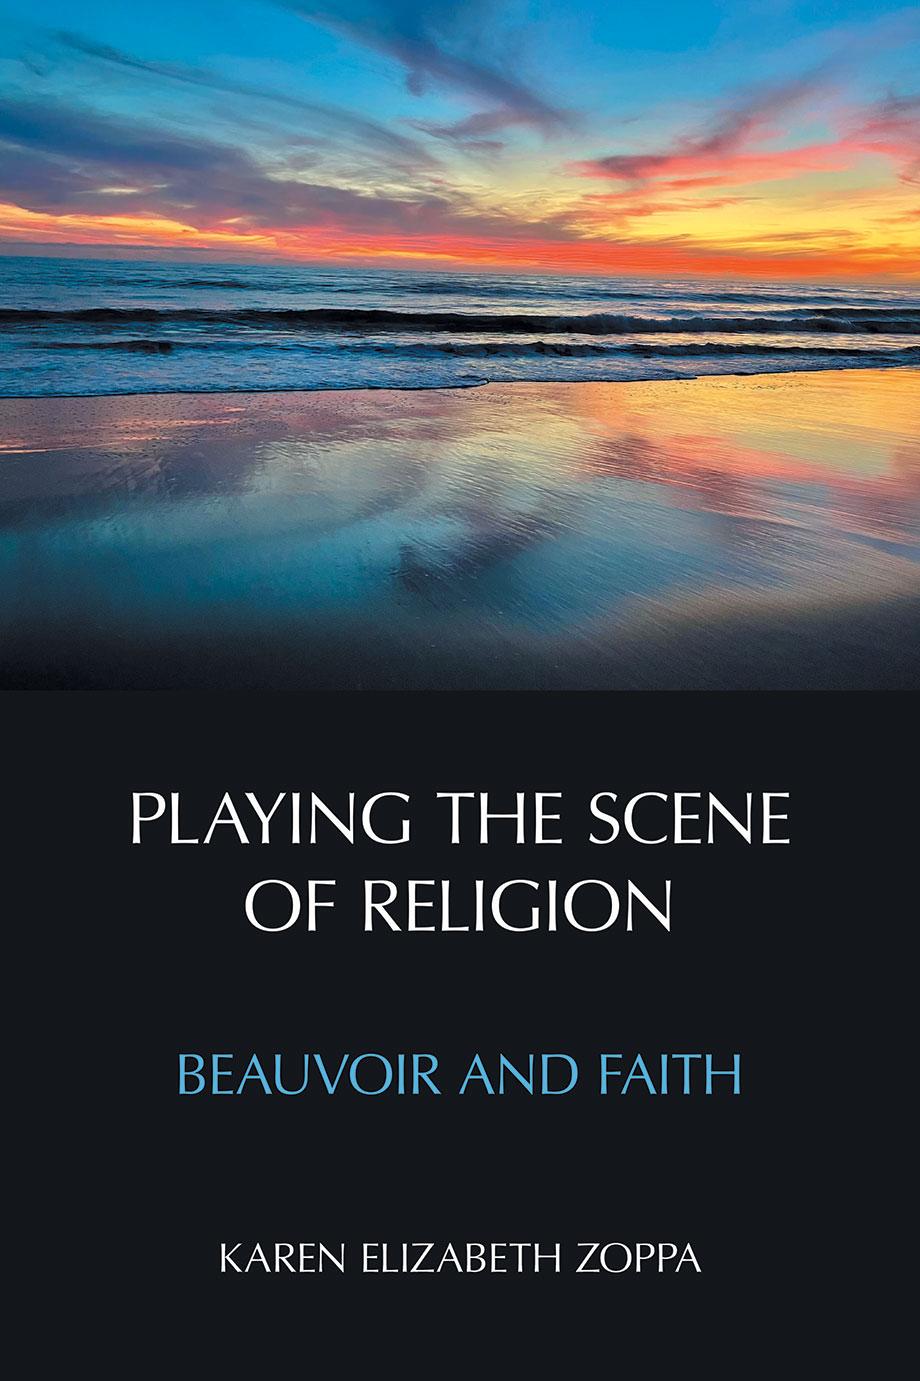 Playing the Scene of Religion - Beauvoir and Faith - Karen Elizabeth Zoppa